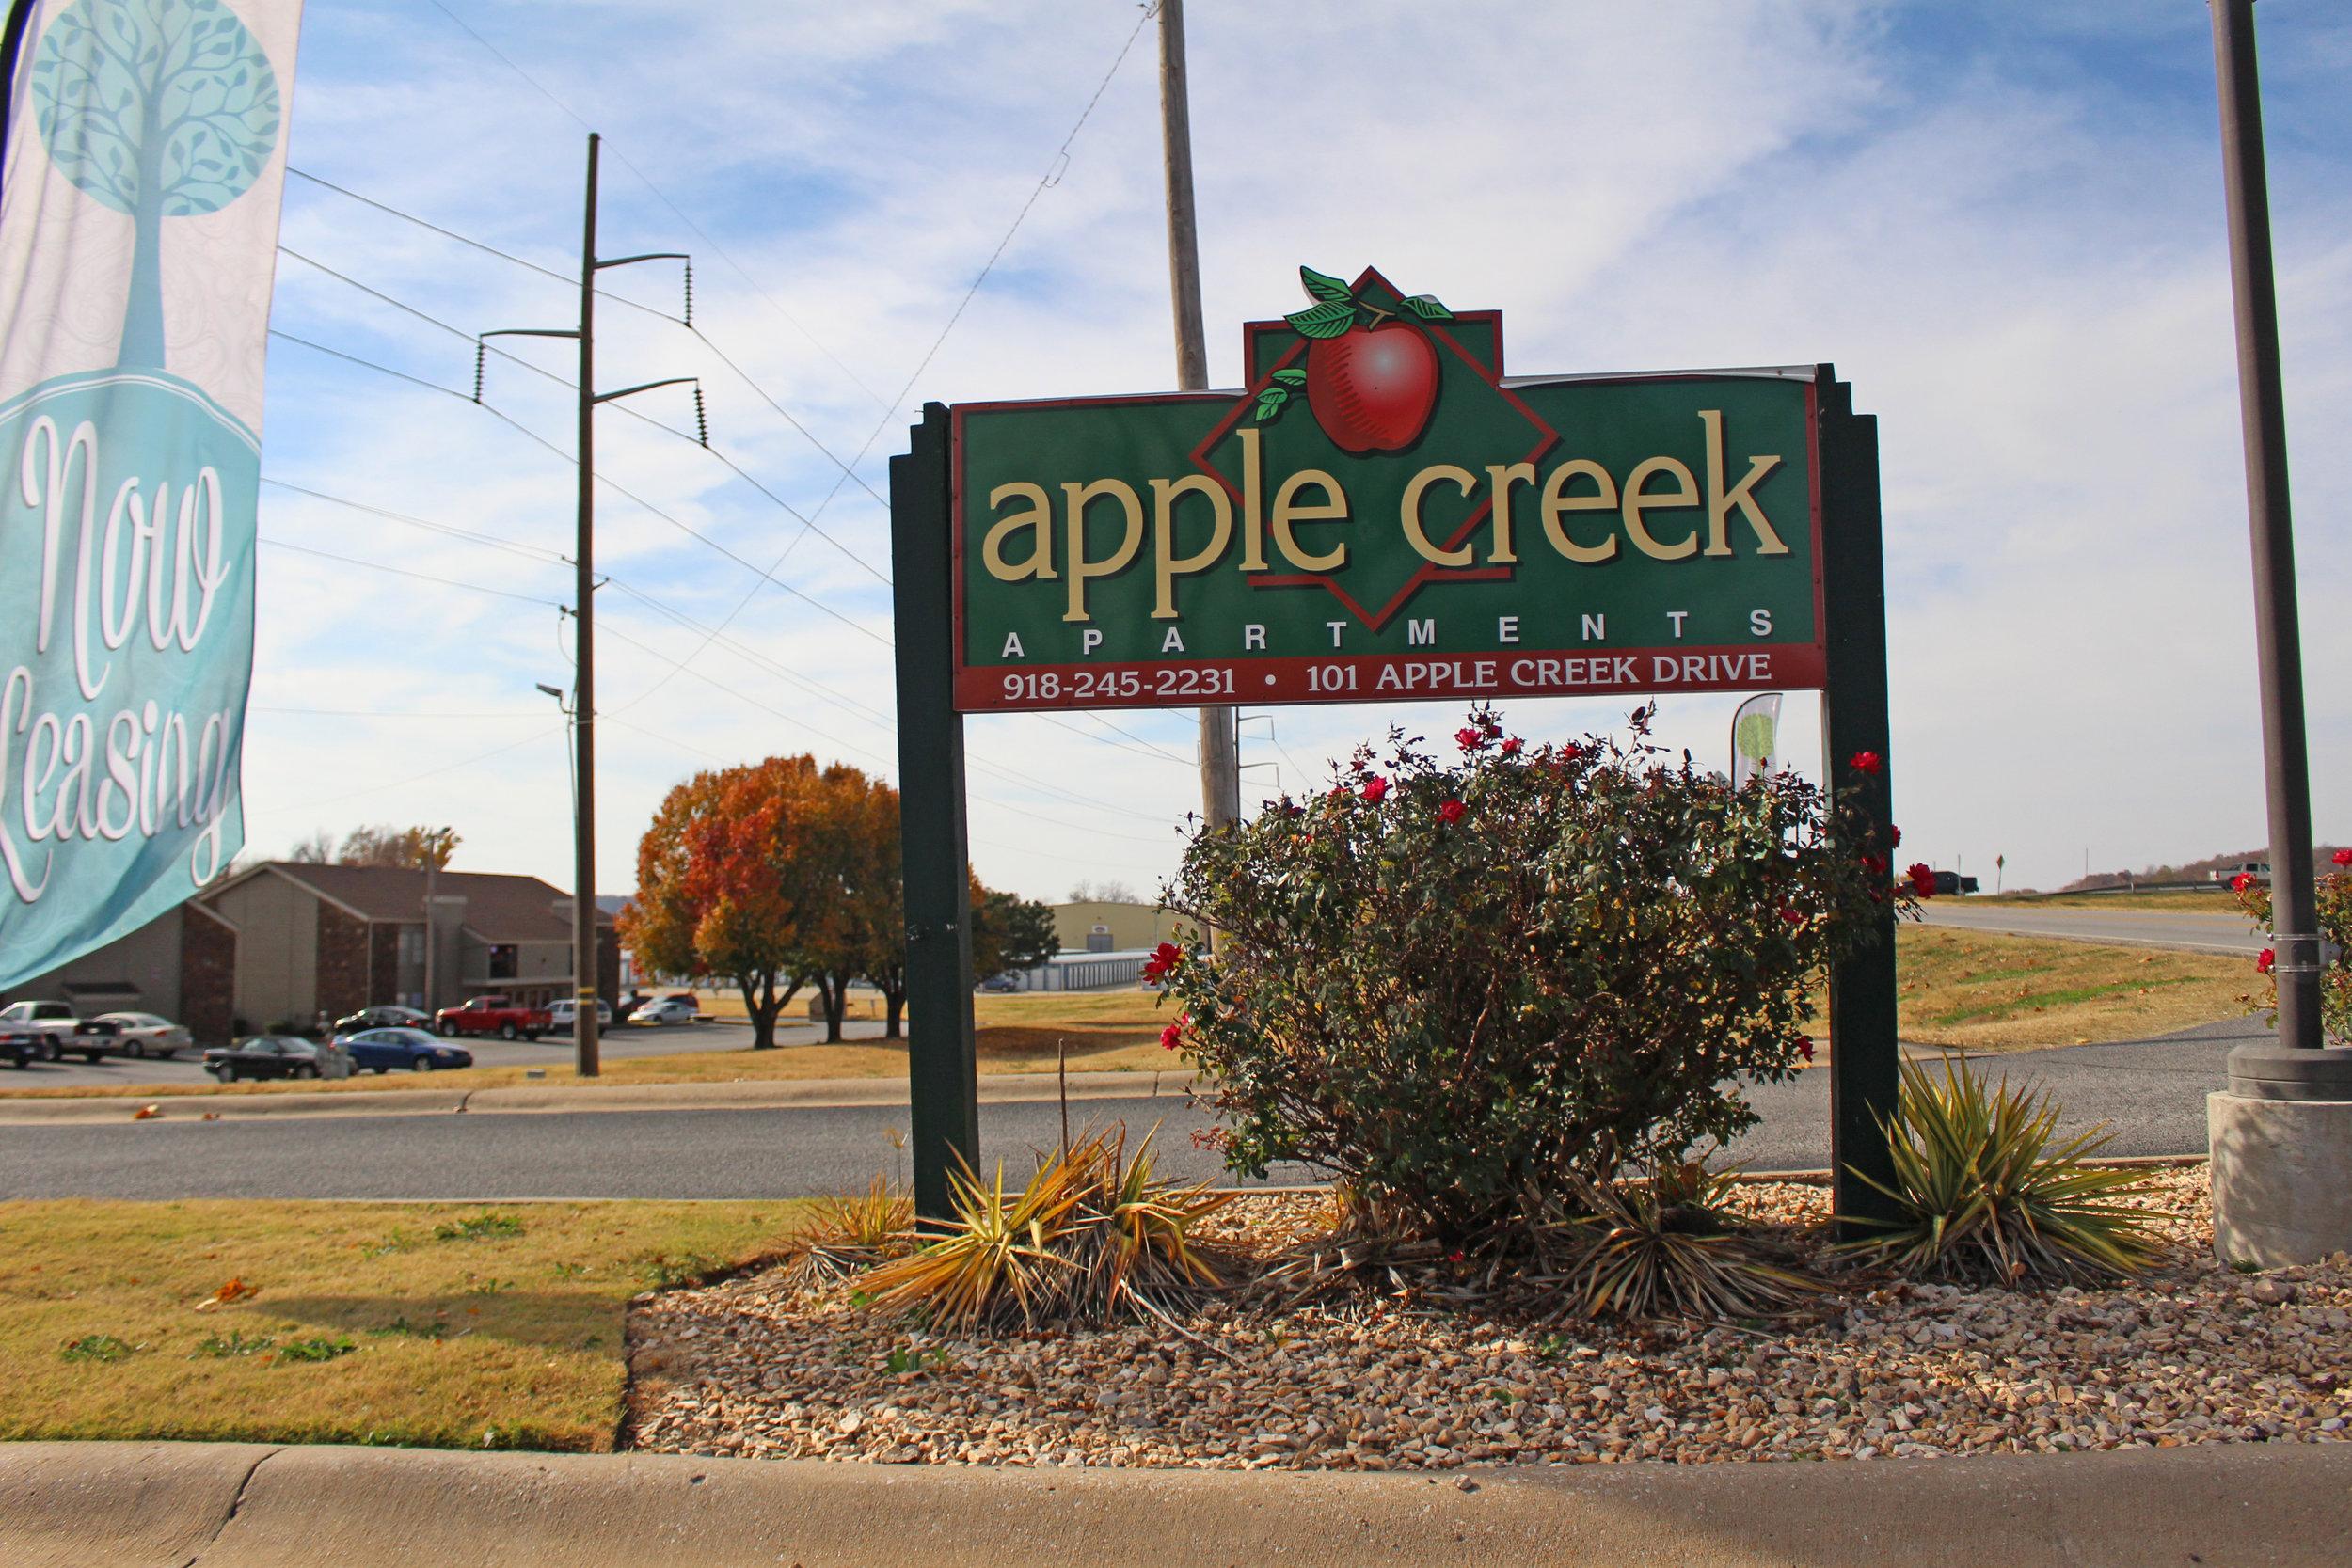 apple creek apartments 101 apple creek drive